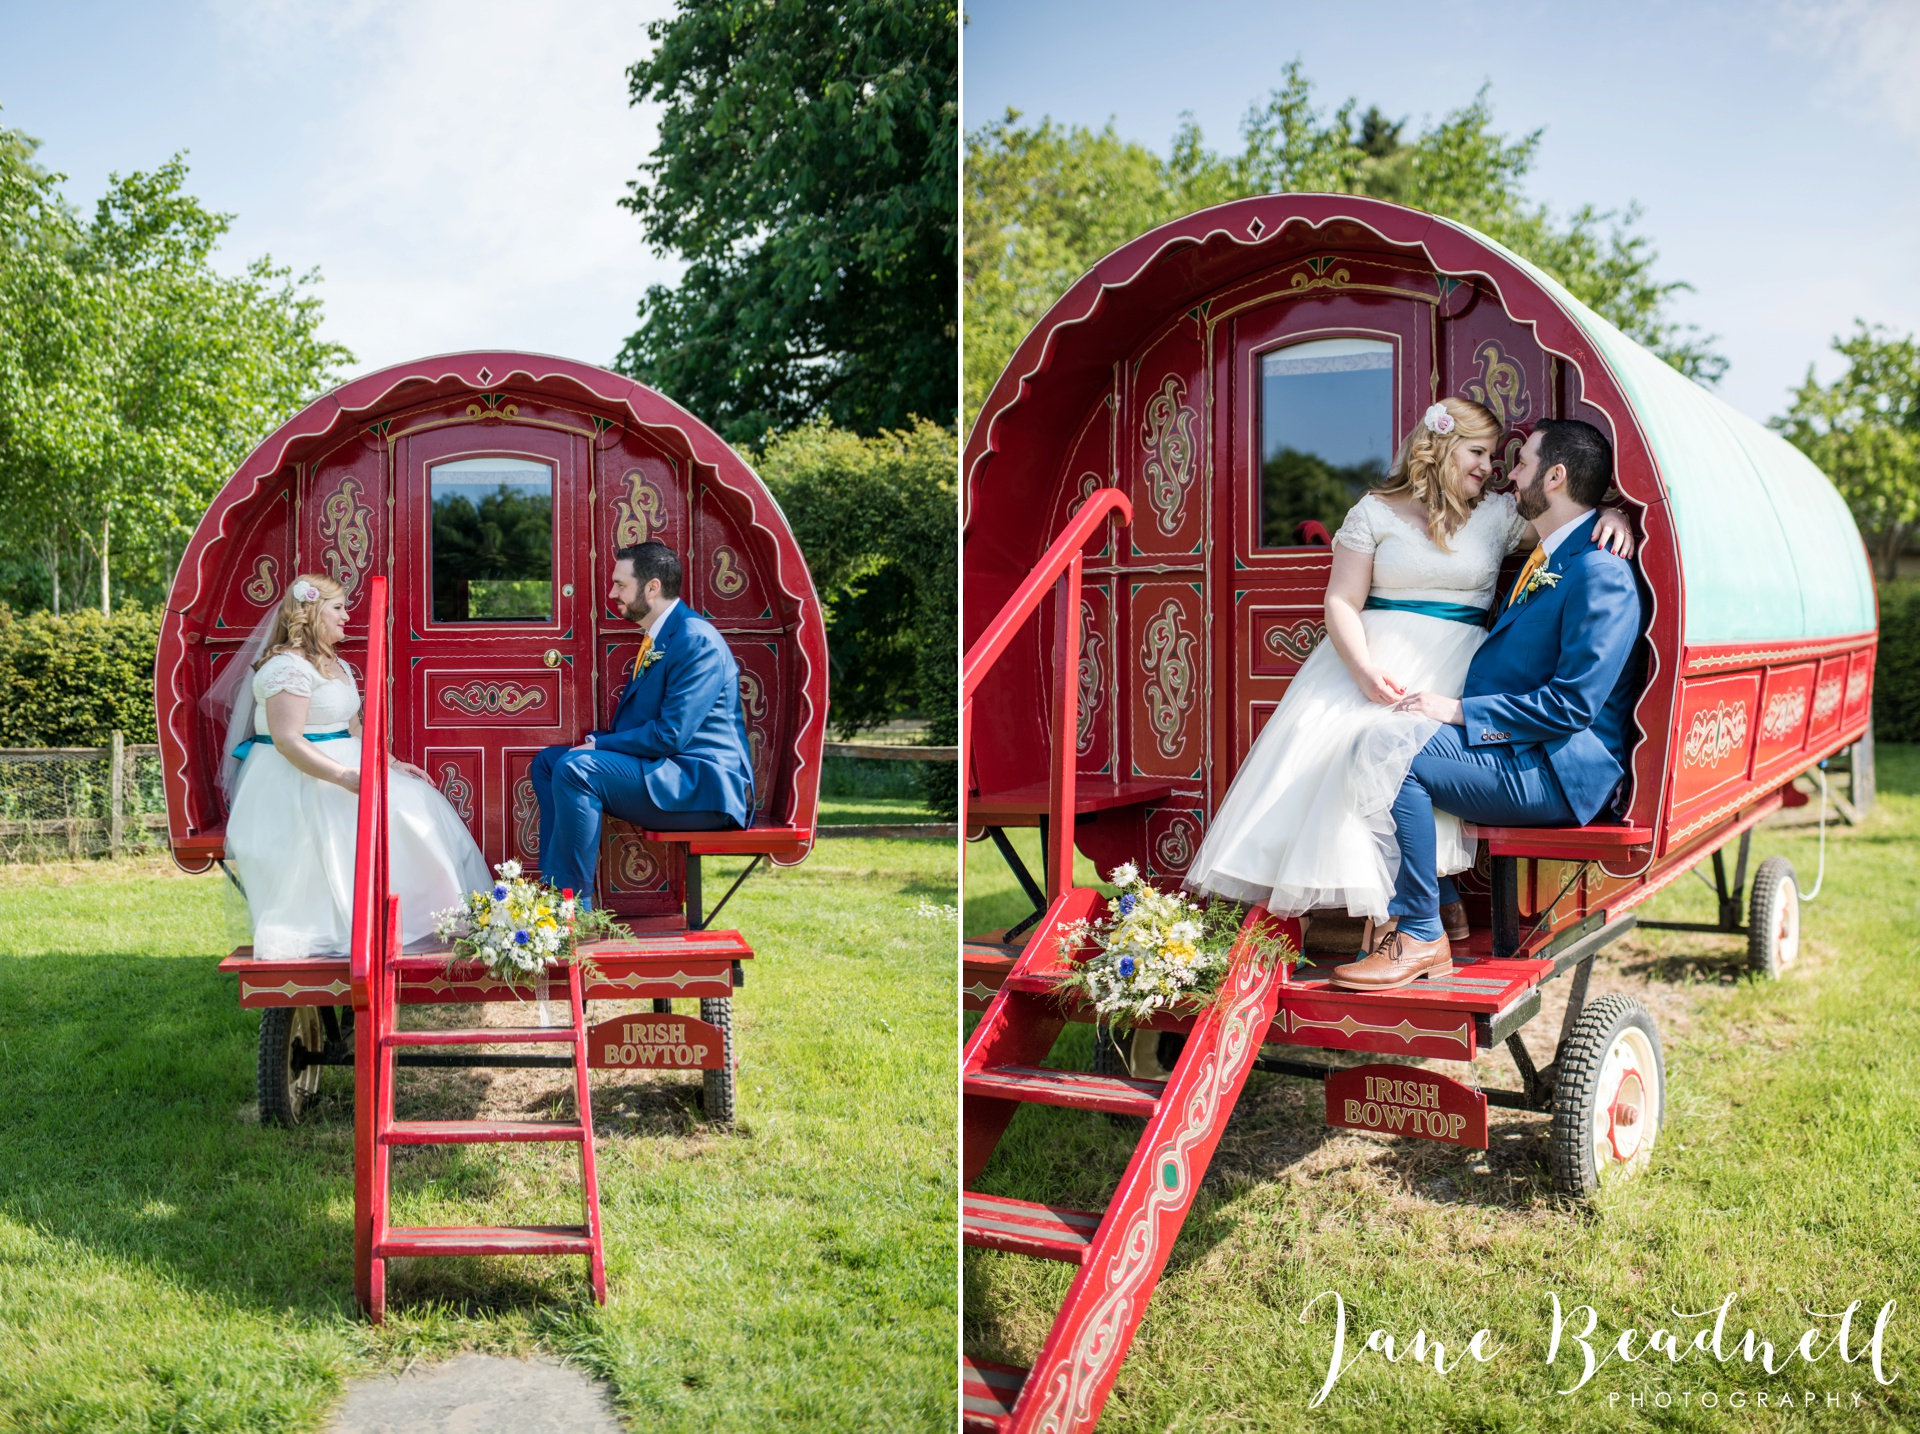 South Farm Wedding photography Hertfordshire by Jane Beadnell Photography fine art wedding photographer_0117